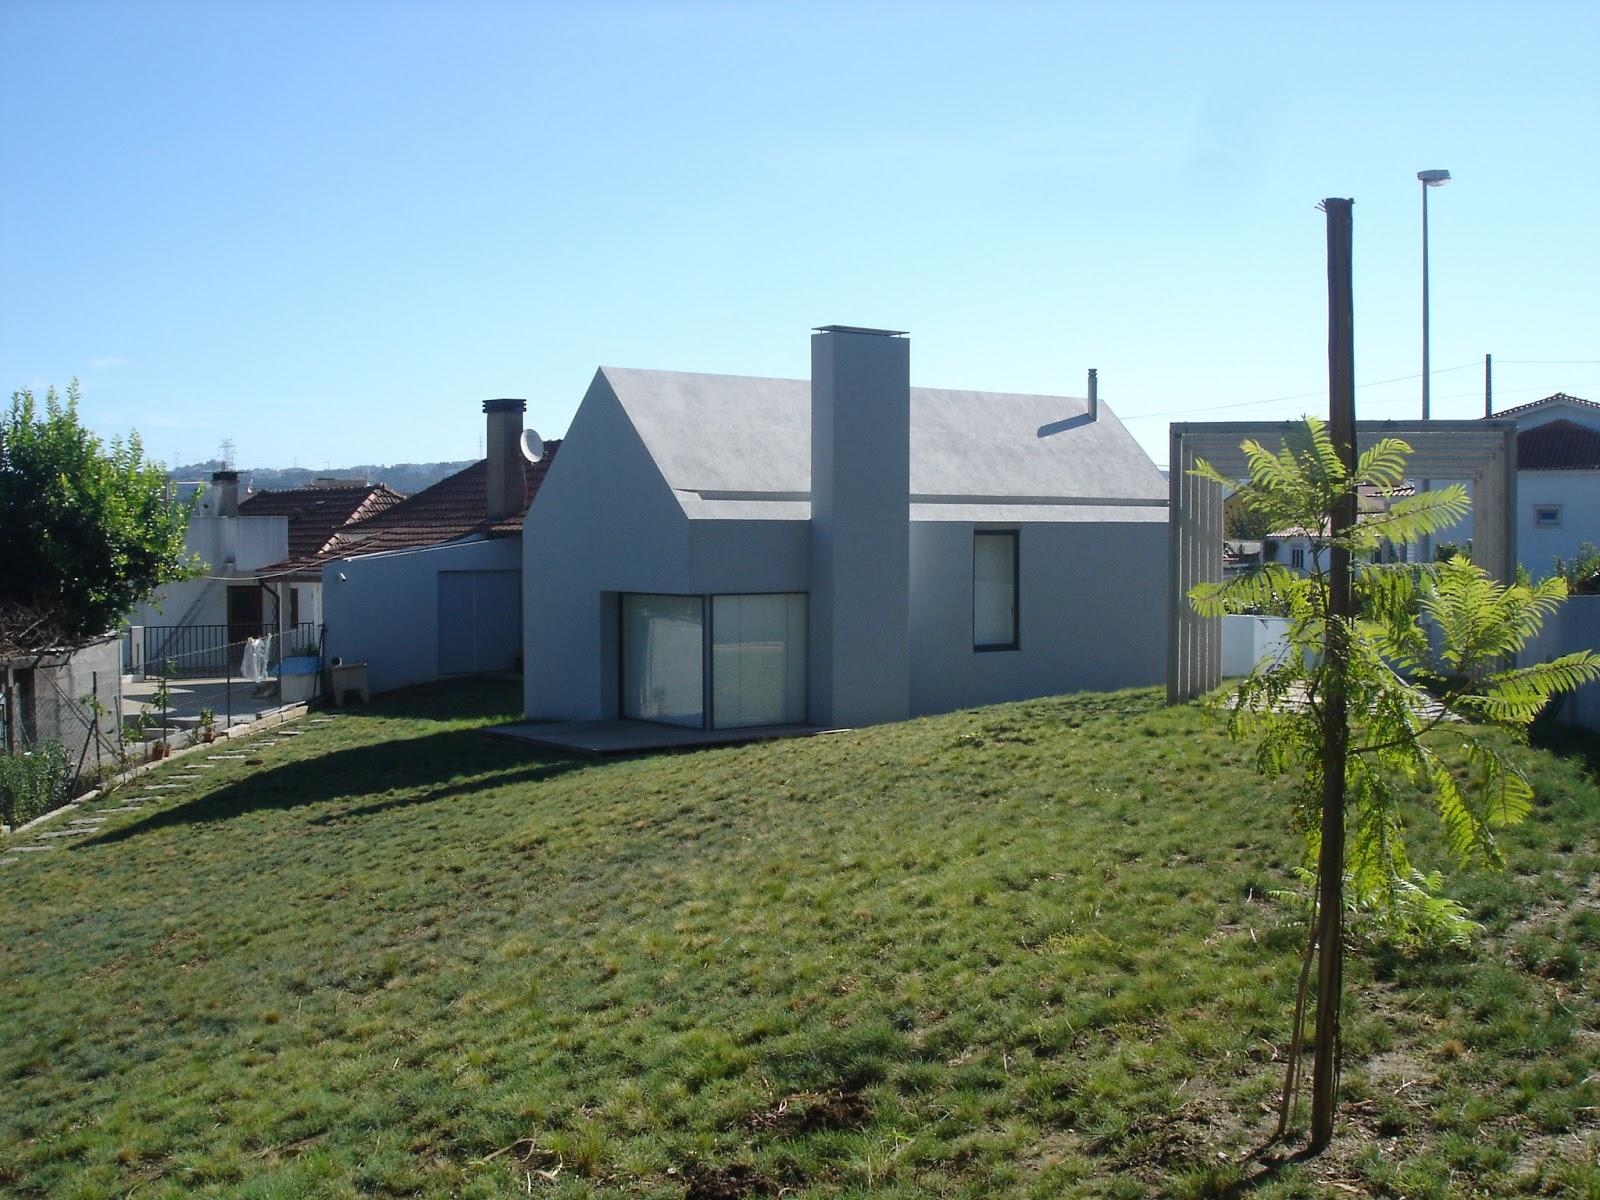 Arquitectos e engenheiros da utopia casa m nima conlu da for Casa minimalista historia